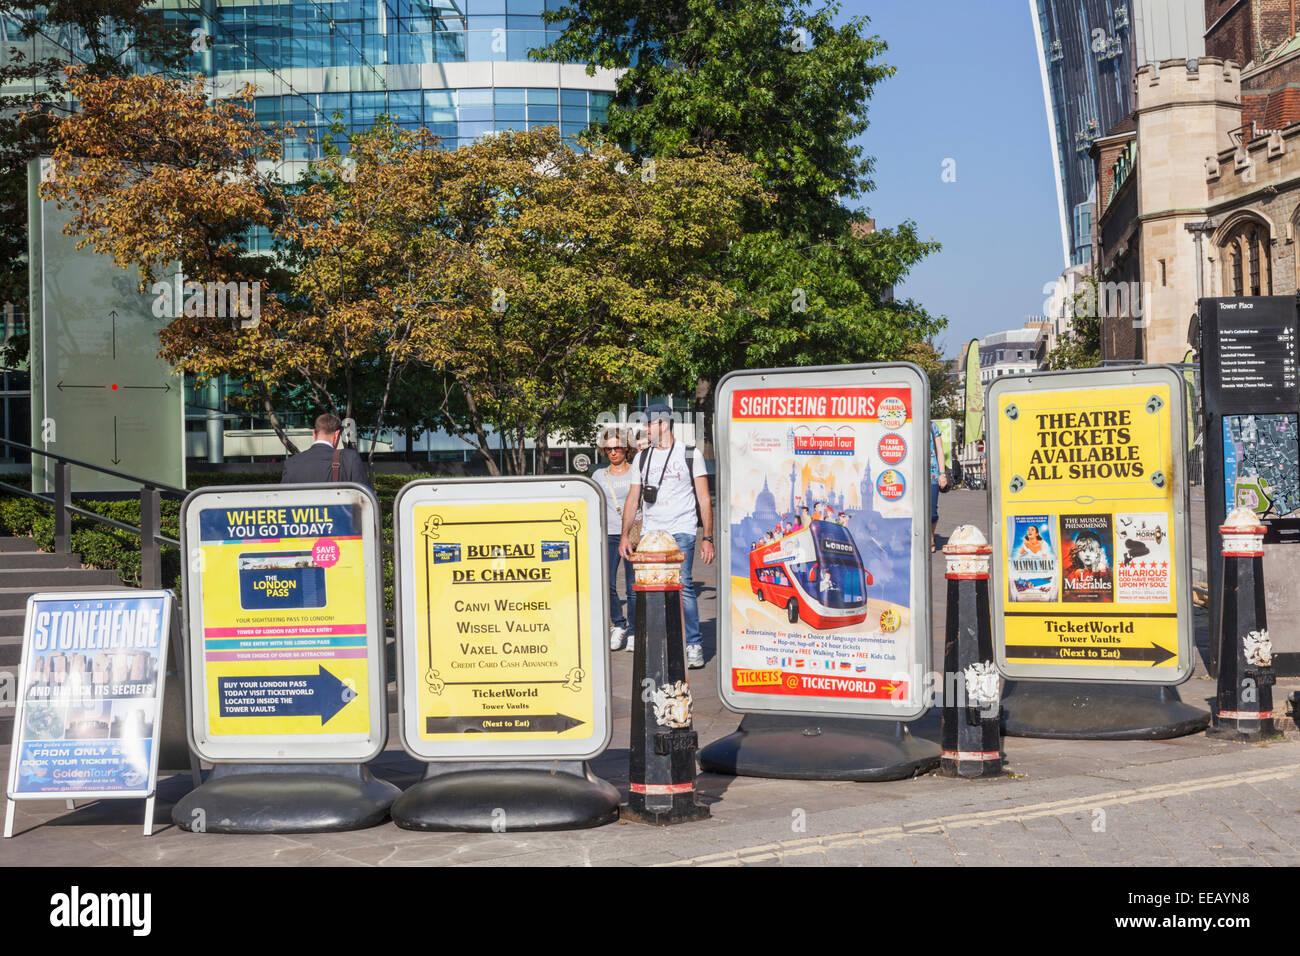 England, London, Advertising Billboards Blocking Footpath Stock Photo